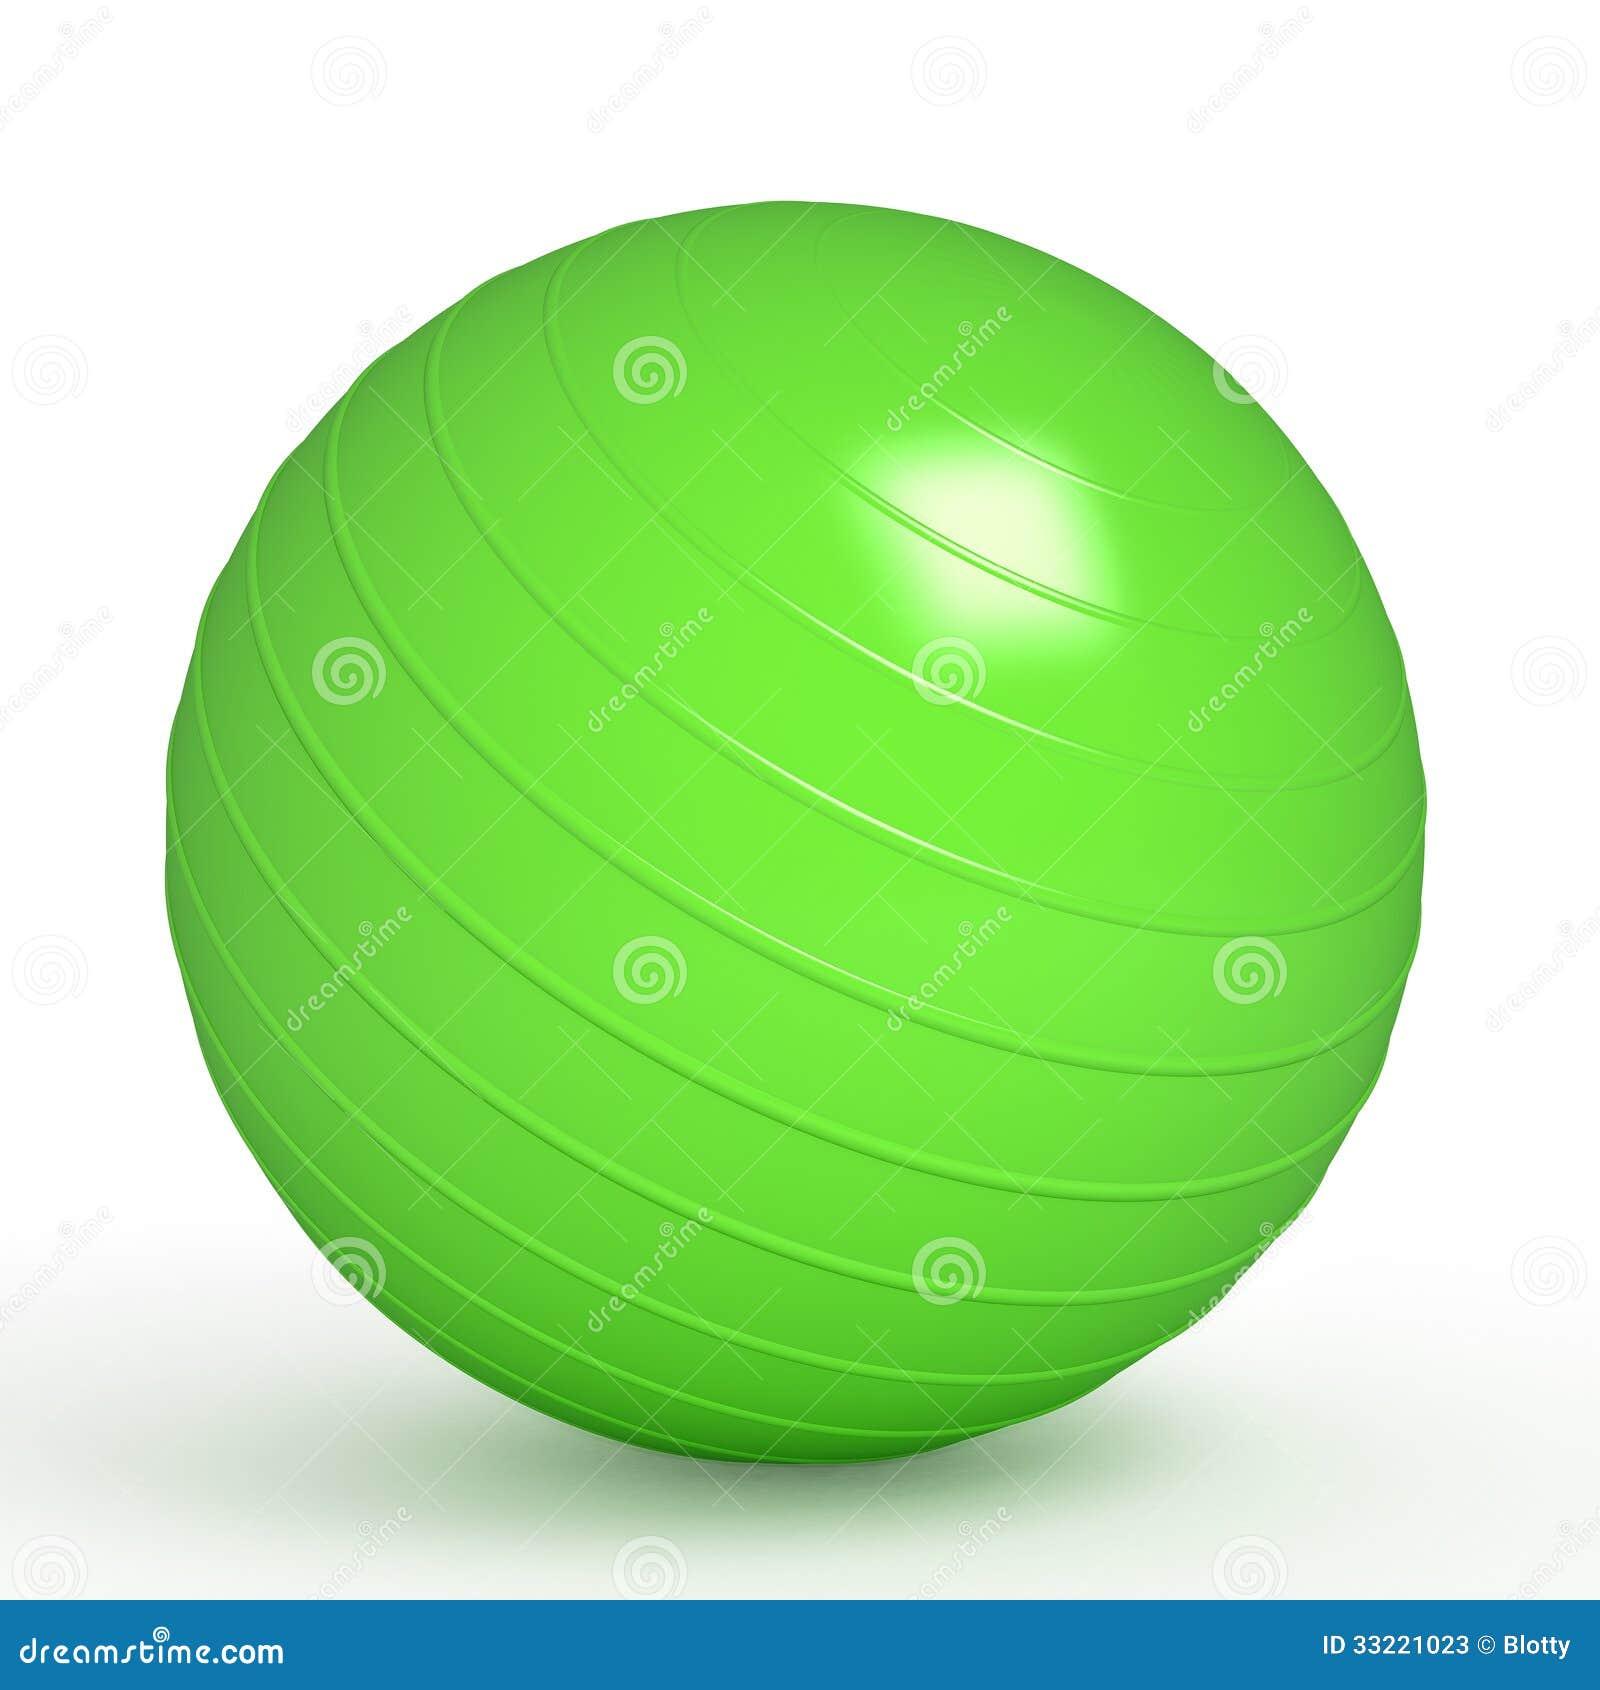 Green Fitness Ball On White Stock Photos - Image: 33221023